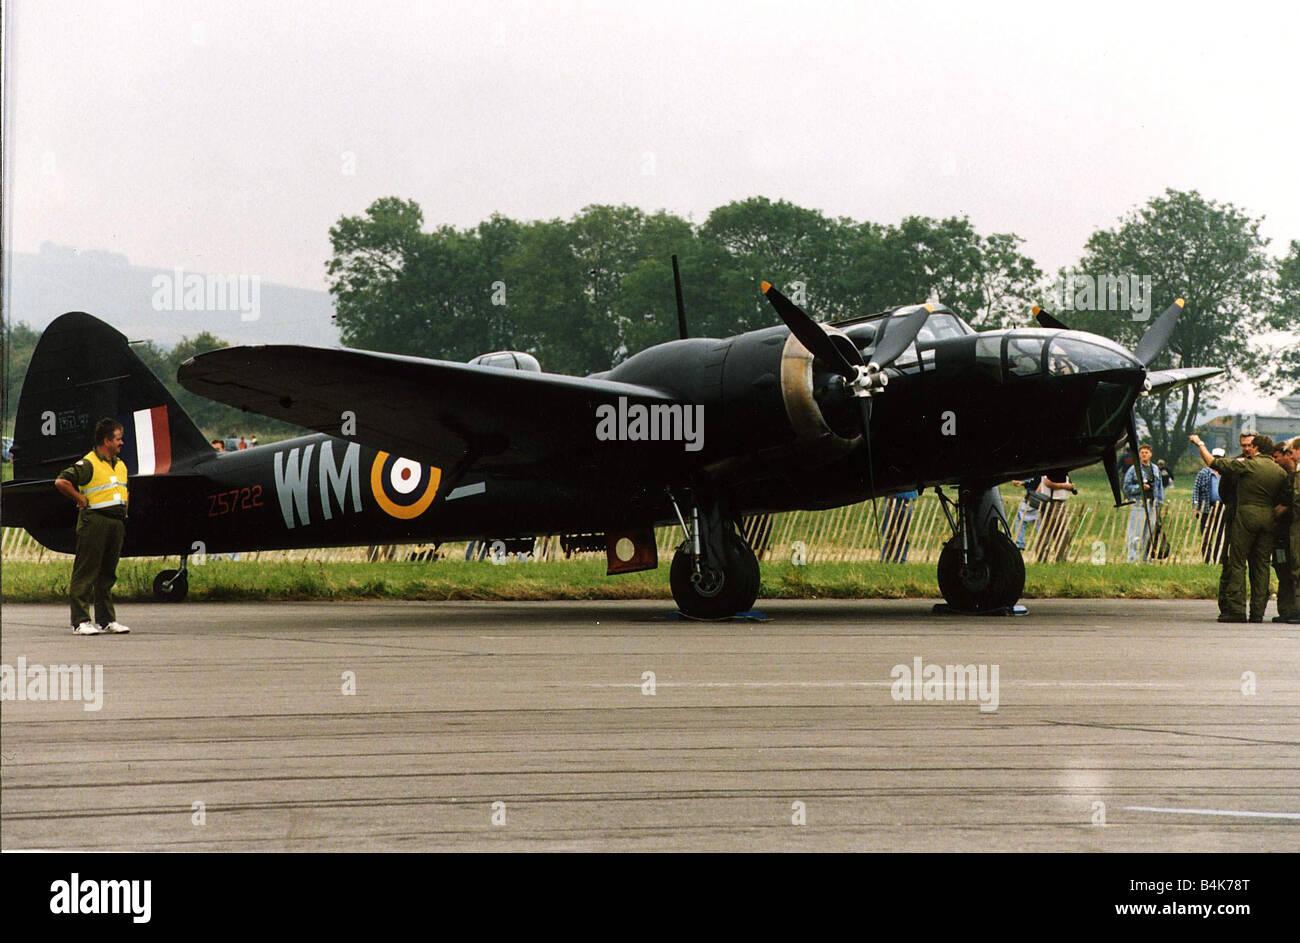 Aircraft Bristol Blenheim WW2 Plane - Stock Image